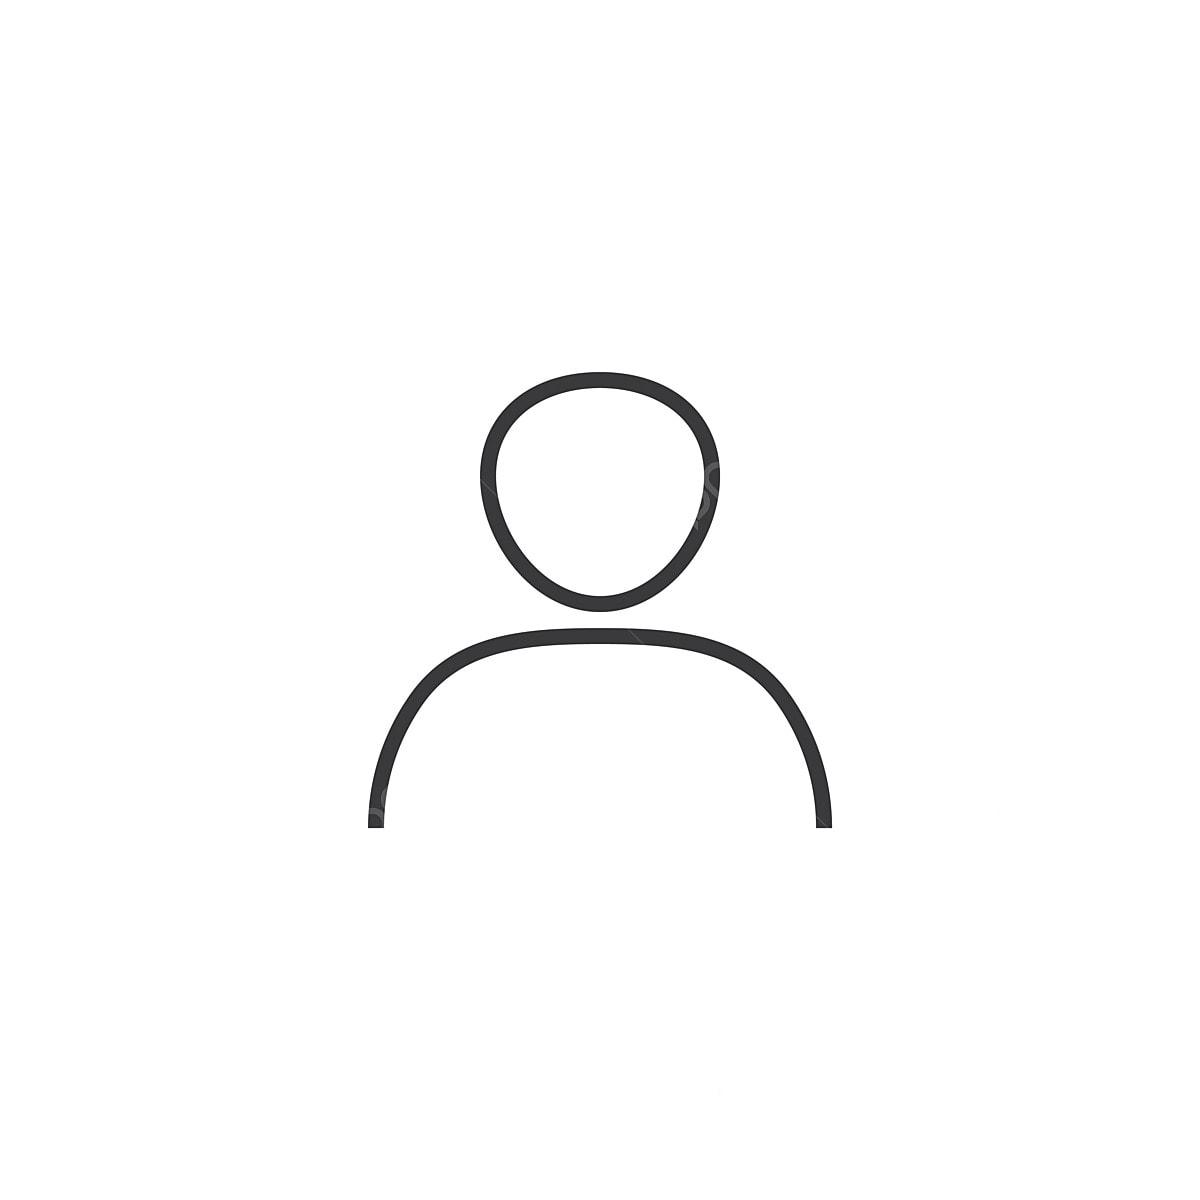 Account Icon Line Style Vector Illustration, Logo, Icon